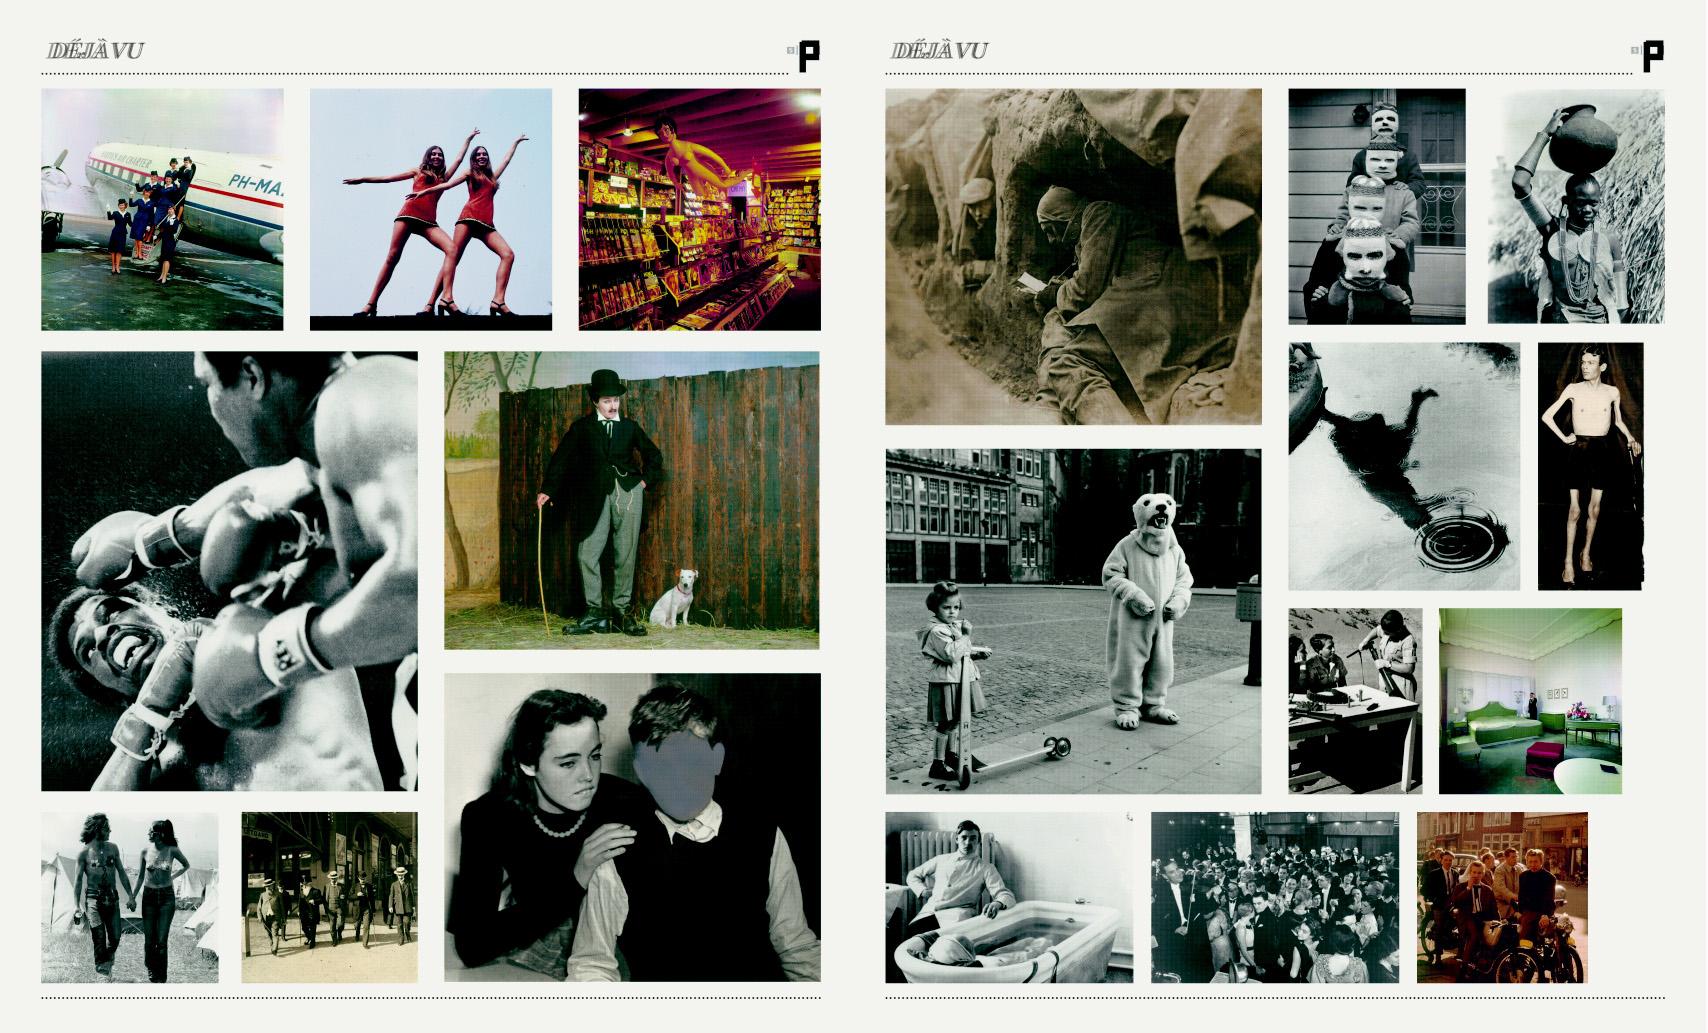 FOTONAARDEN+SPAARNESTAD_20-04-17_Cortina_Pagina004#2+RAM_SPREAD.jpg